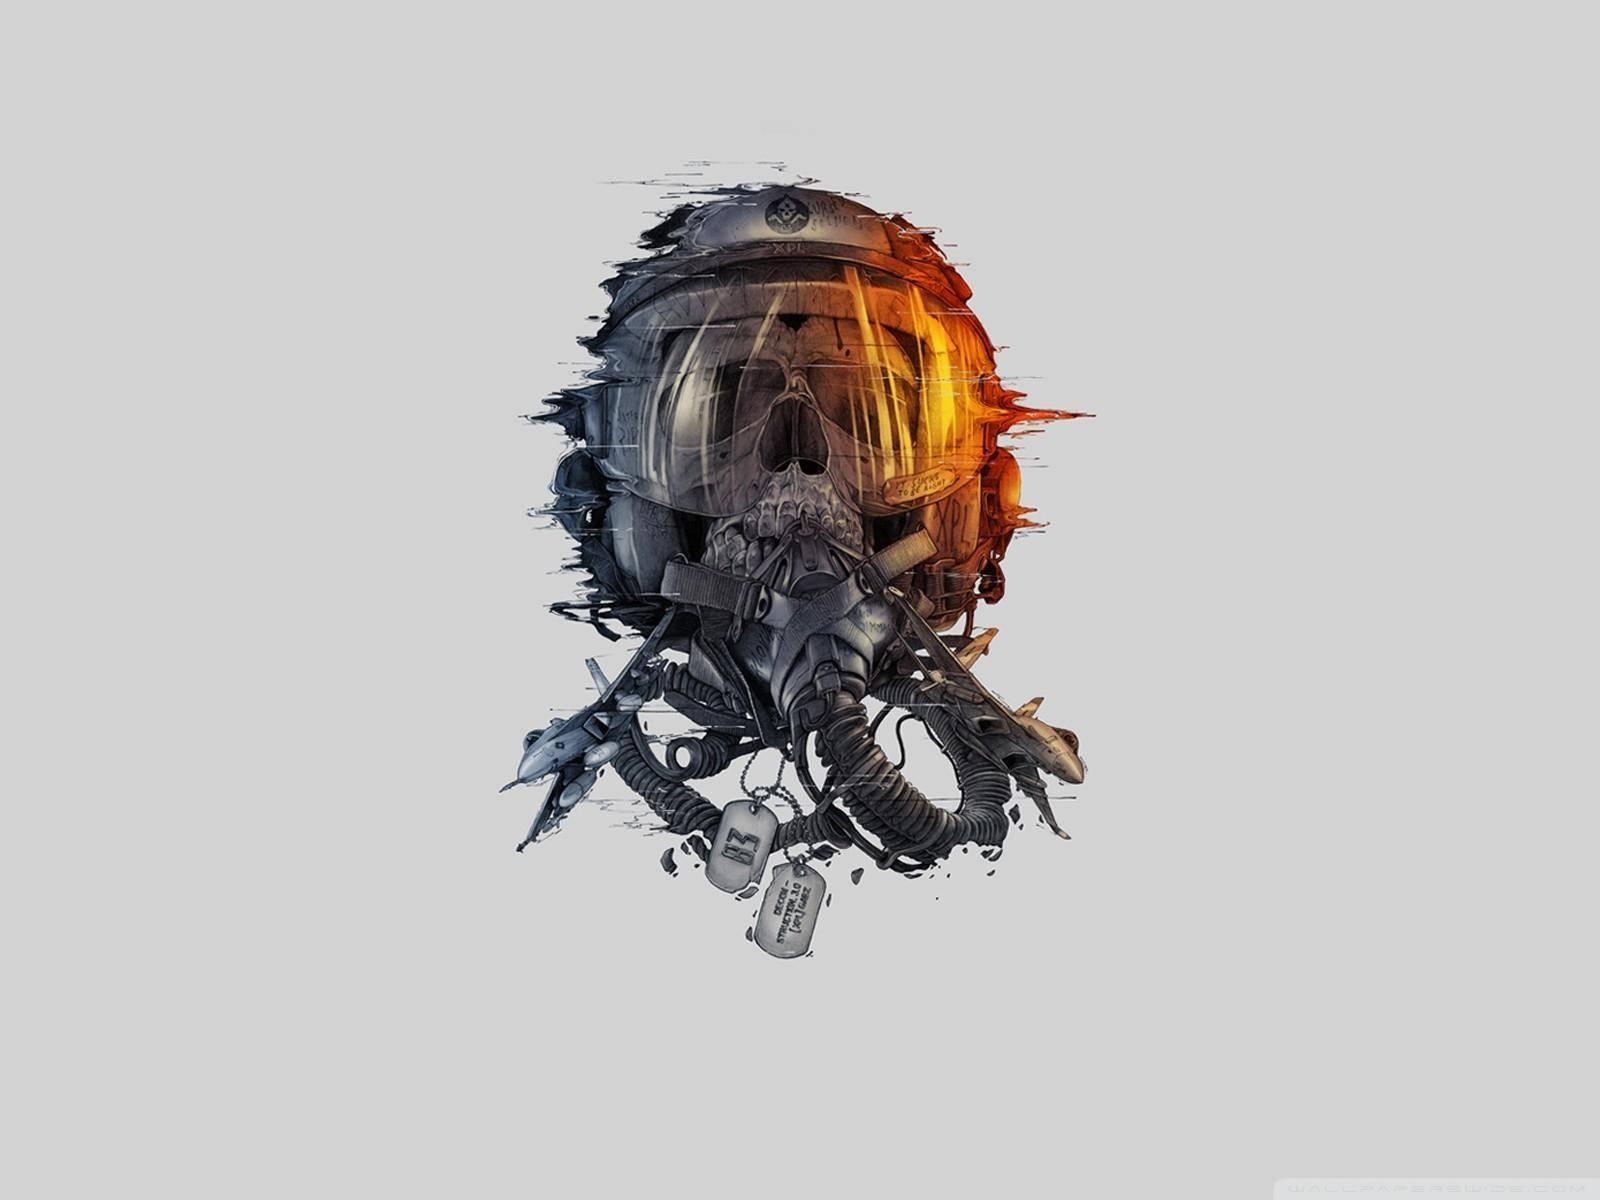 Battlefield 3 Mask